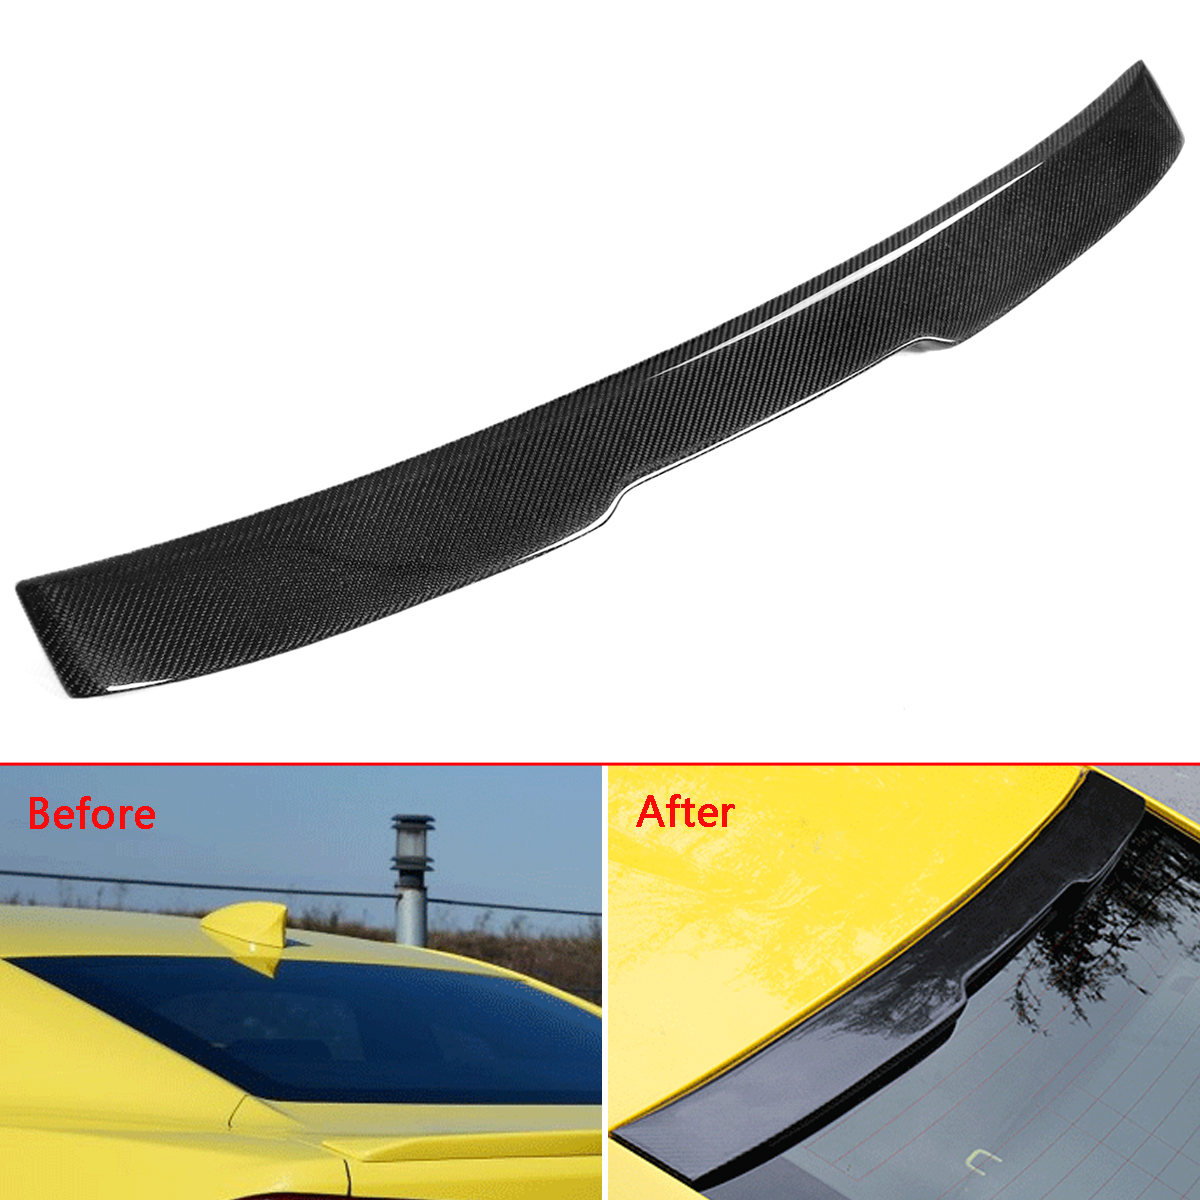 1x Carbon Fiber Rear Roof Spoiler Car Rear Wing Spoiler For Chevy Camaro LT RS Sport 2016-2018 Auto Spoiler Rear Window Wing Car стоимость